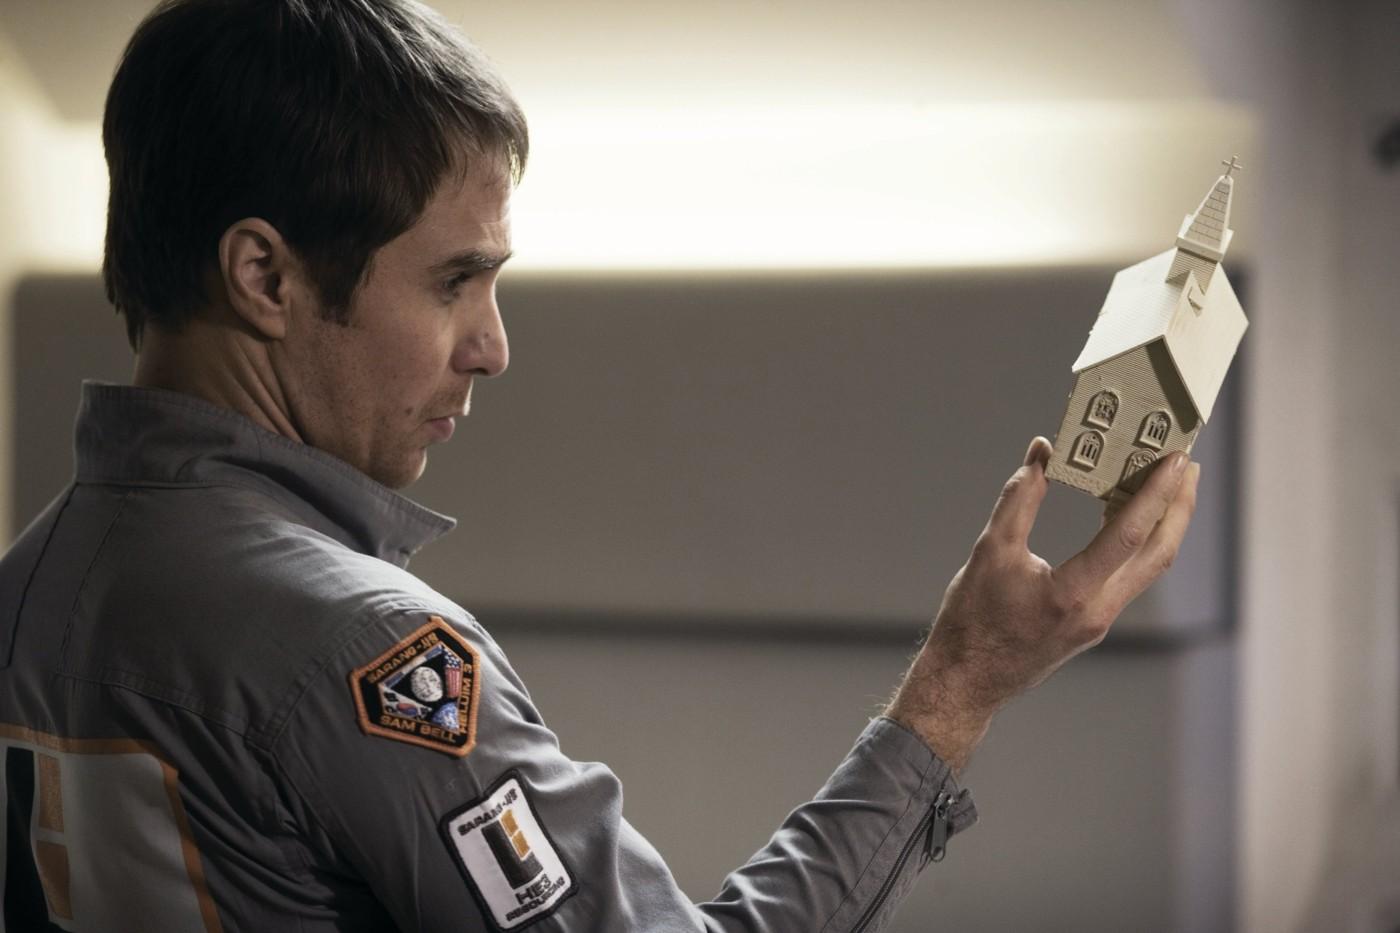 Moonsdffsadfsdd - 8 فیلم فوق العاده جذابی که تنها یک بازیگر دارند!